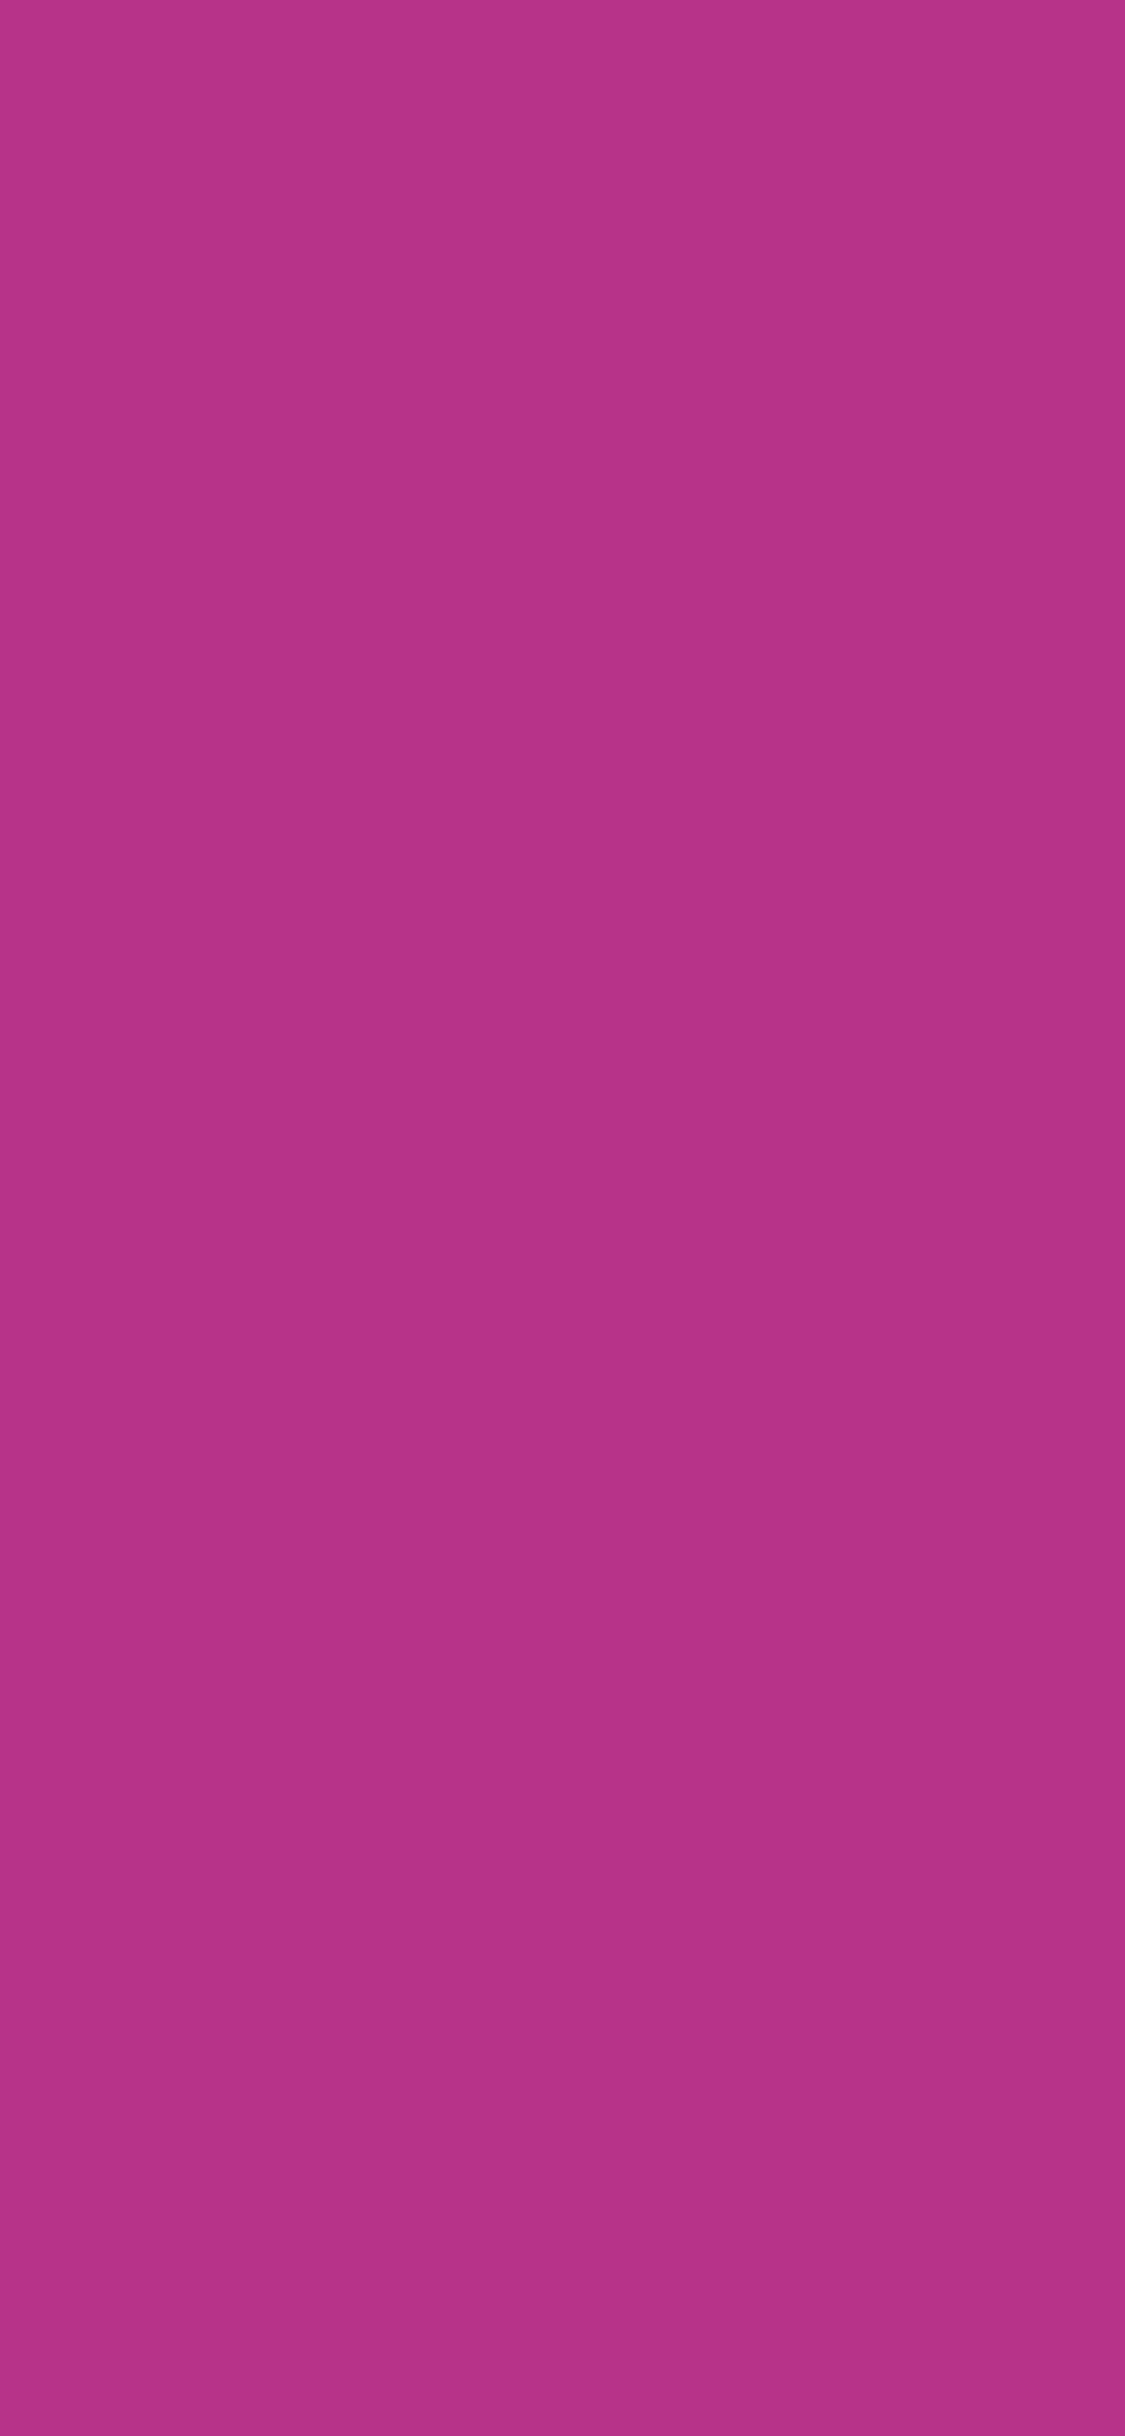 1125x2436 Fandango Solid Color Background